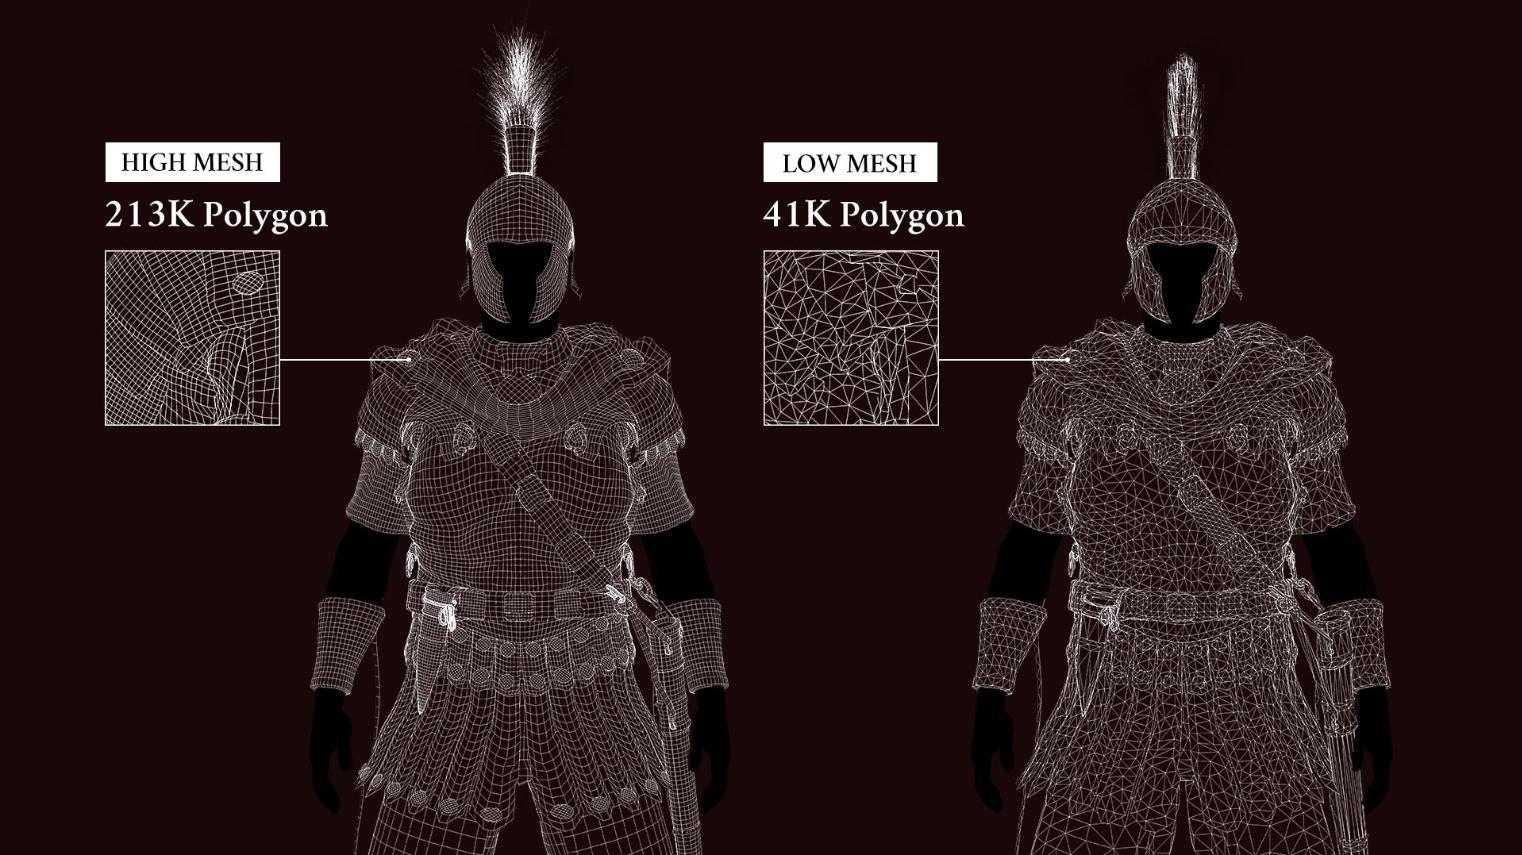 https://forum.reallusion.com/uploads/images/62fa00a2-4d49-4d22-9209-d5bc.jpg